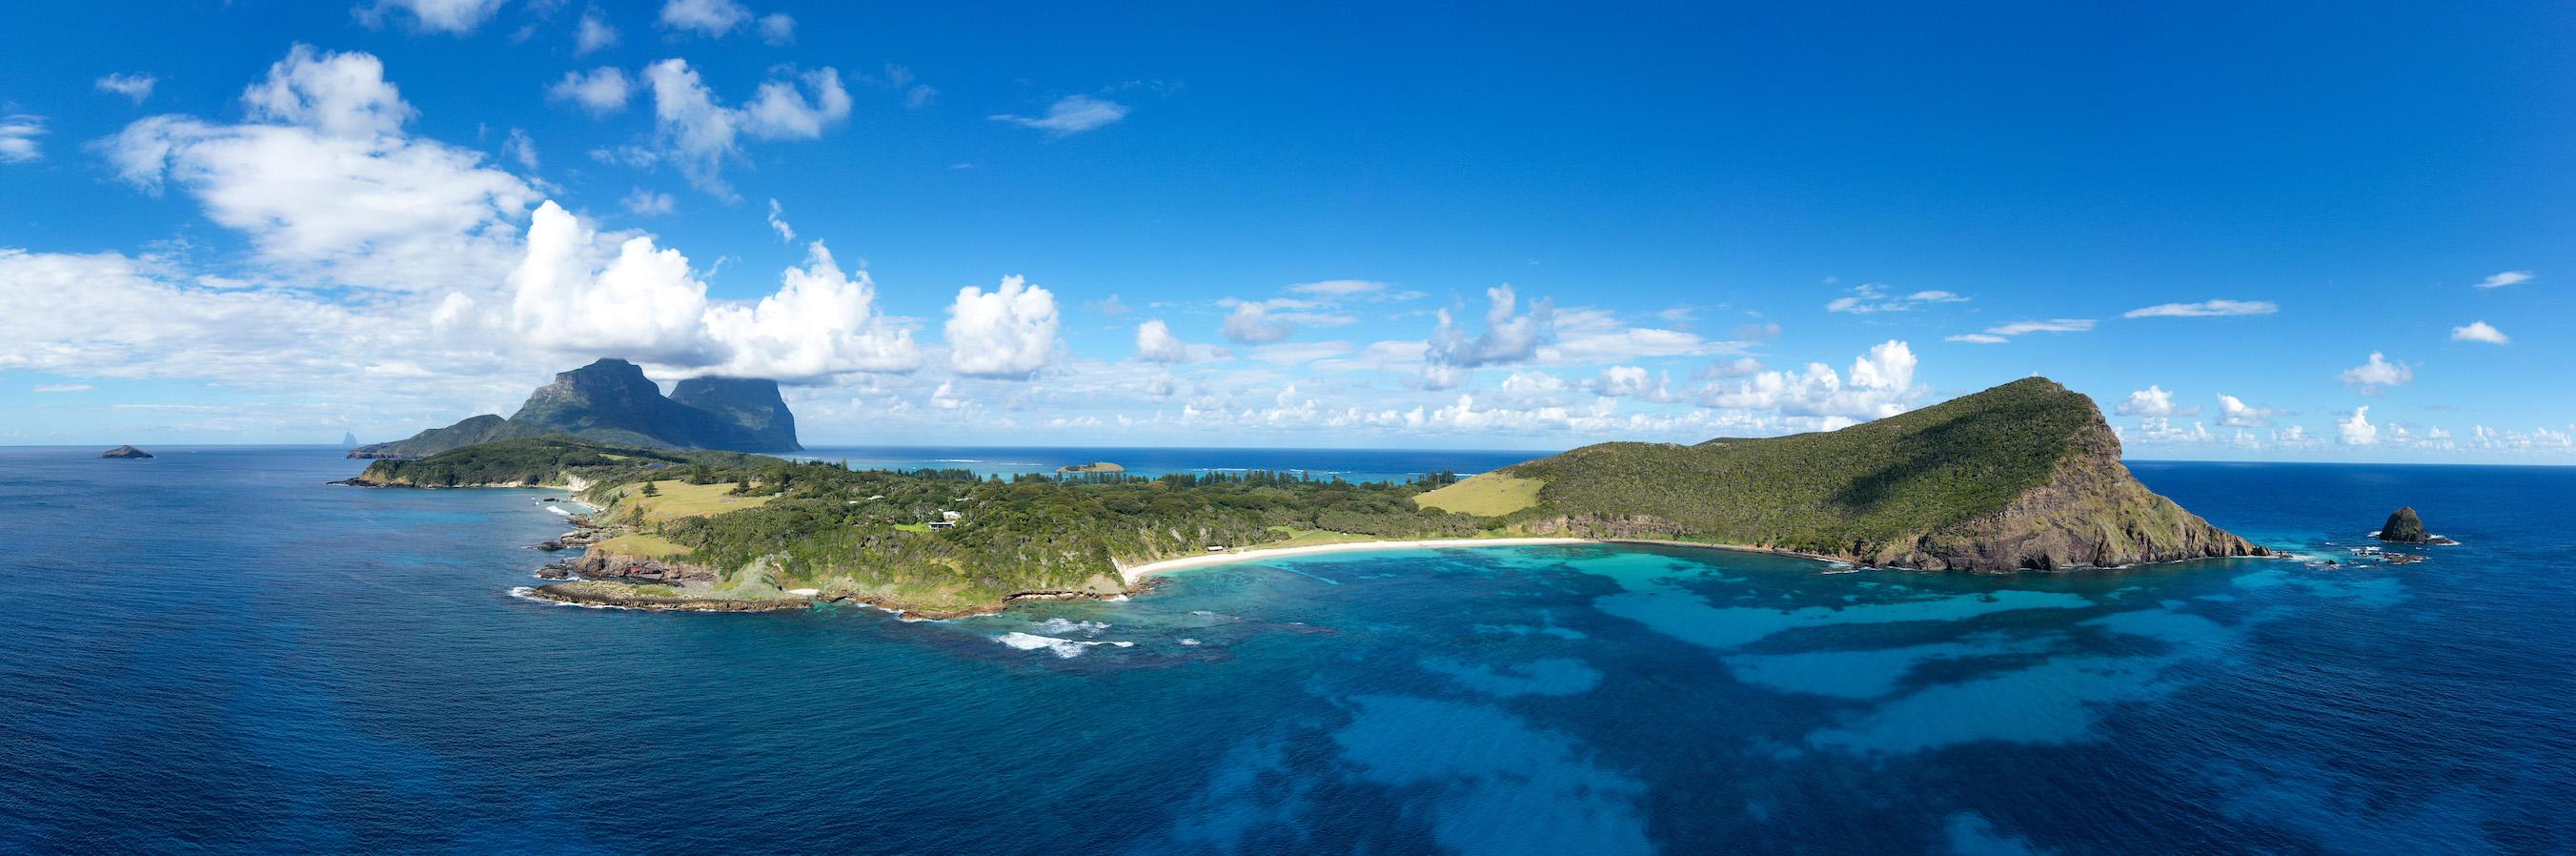 Ned's Beach drone pano photo